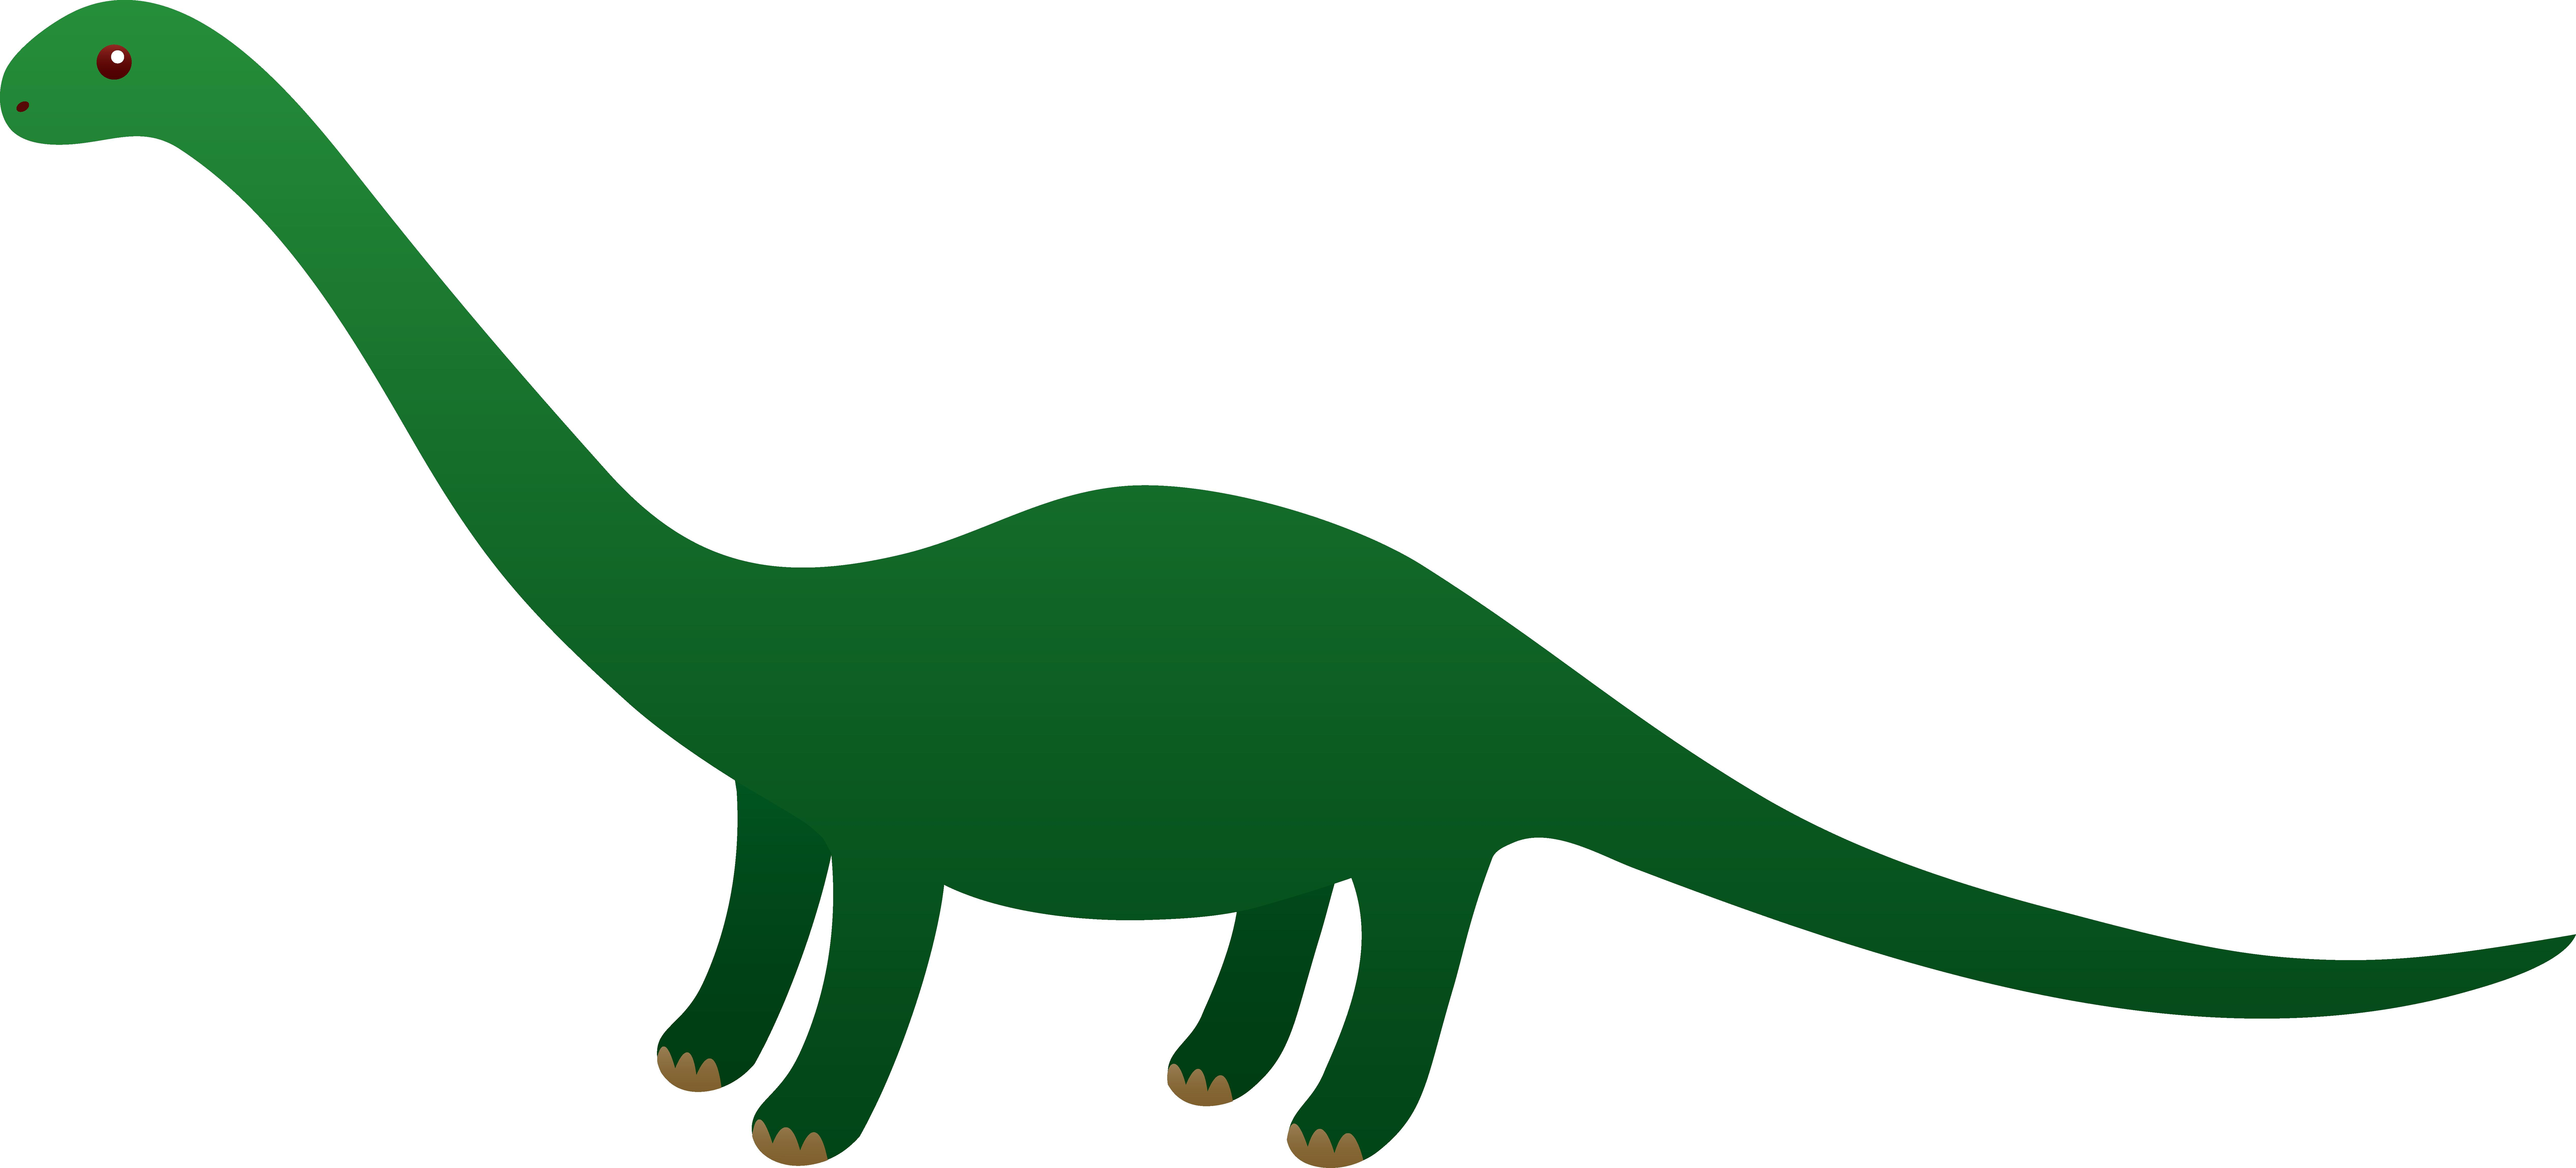 Brontosaurus Or Apatosaurus Dinosaur Free clipart free image.